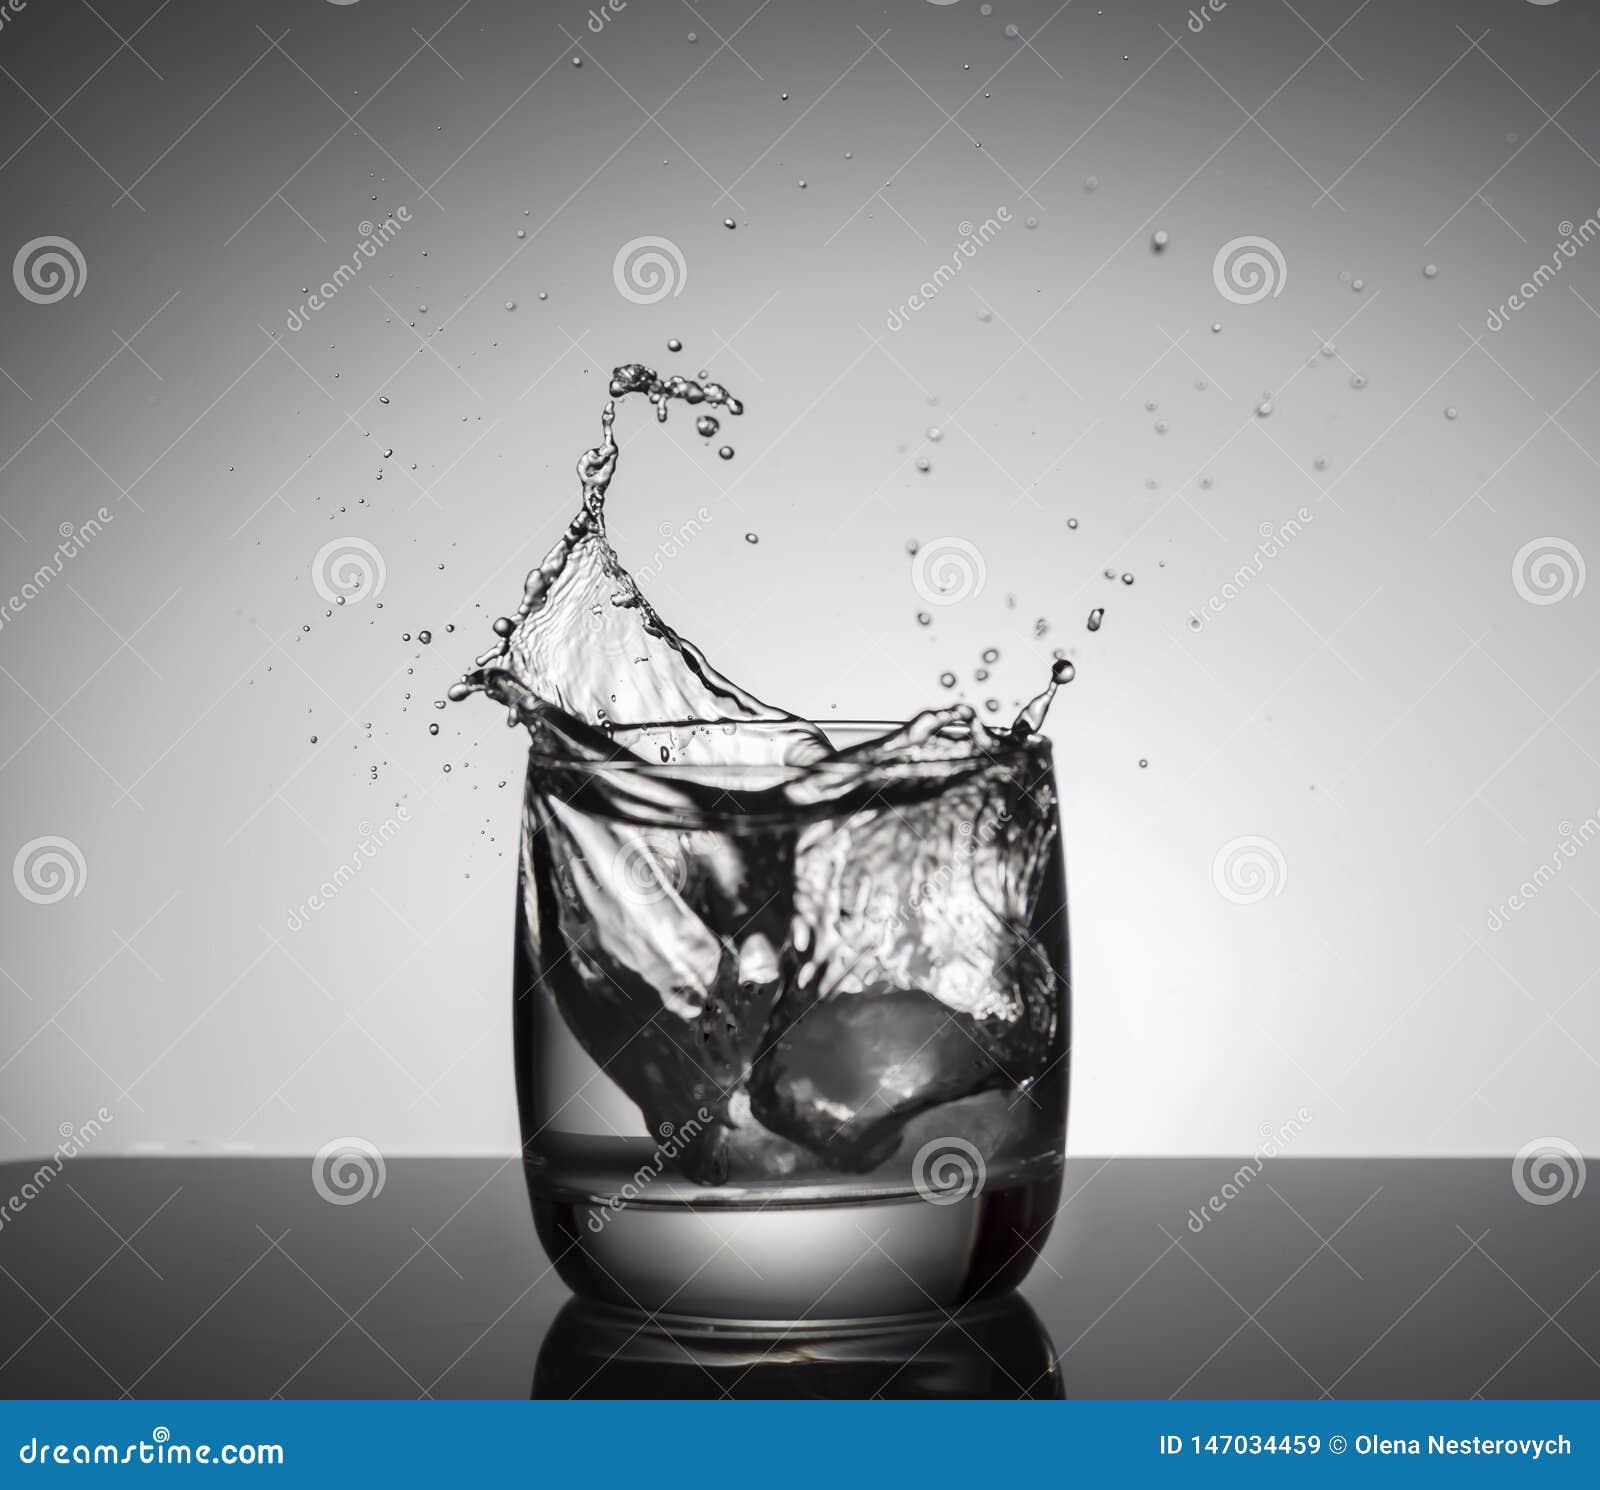 Sze?cian?w szk?a lodu che?botania woda